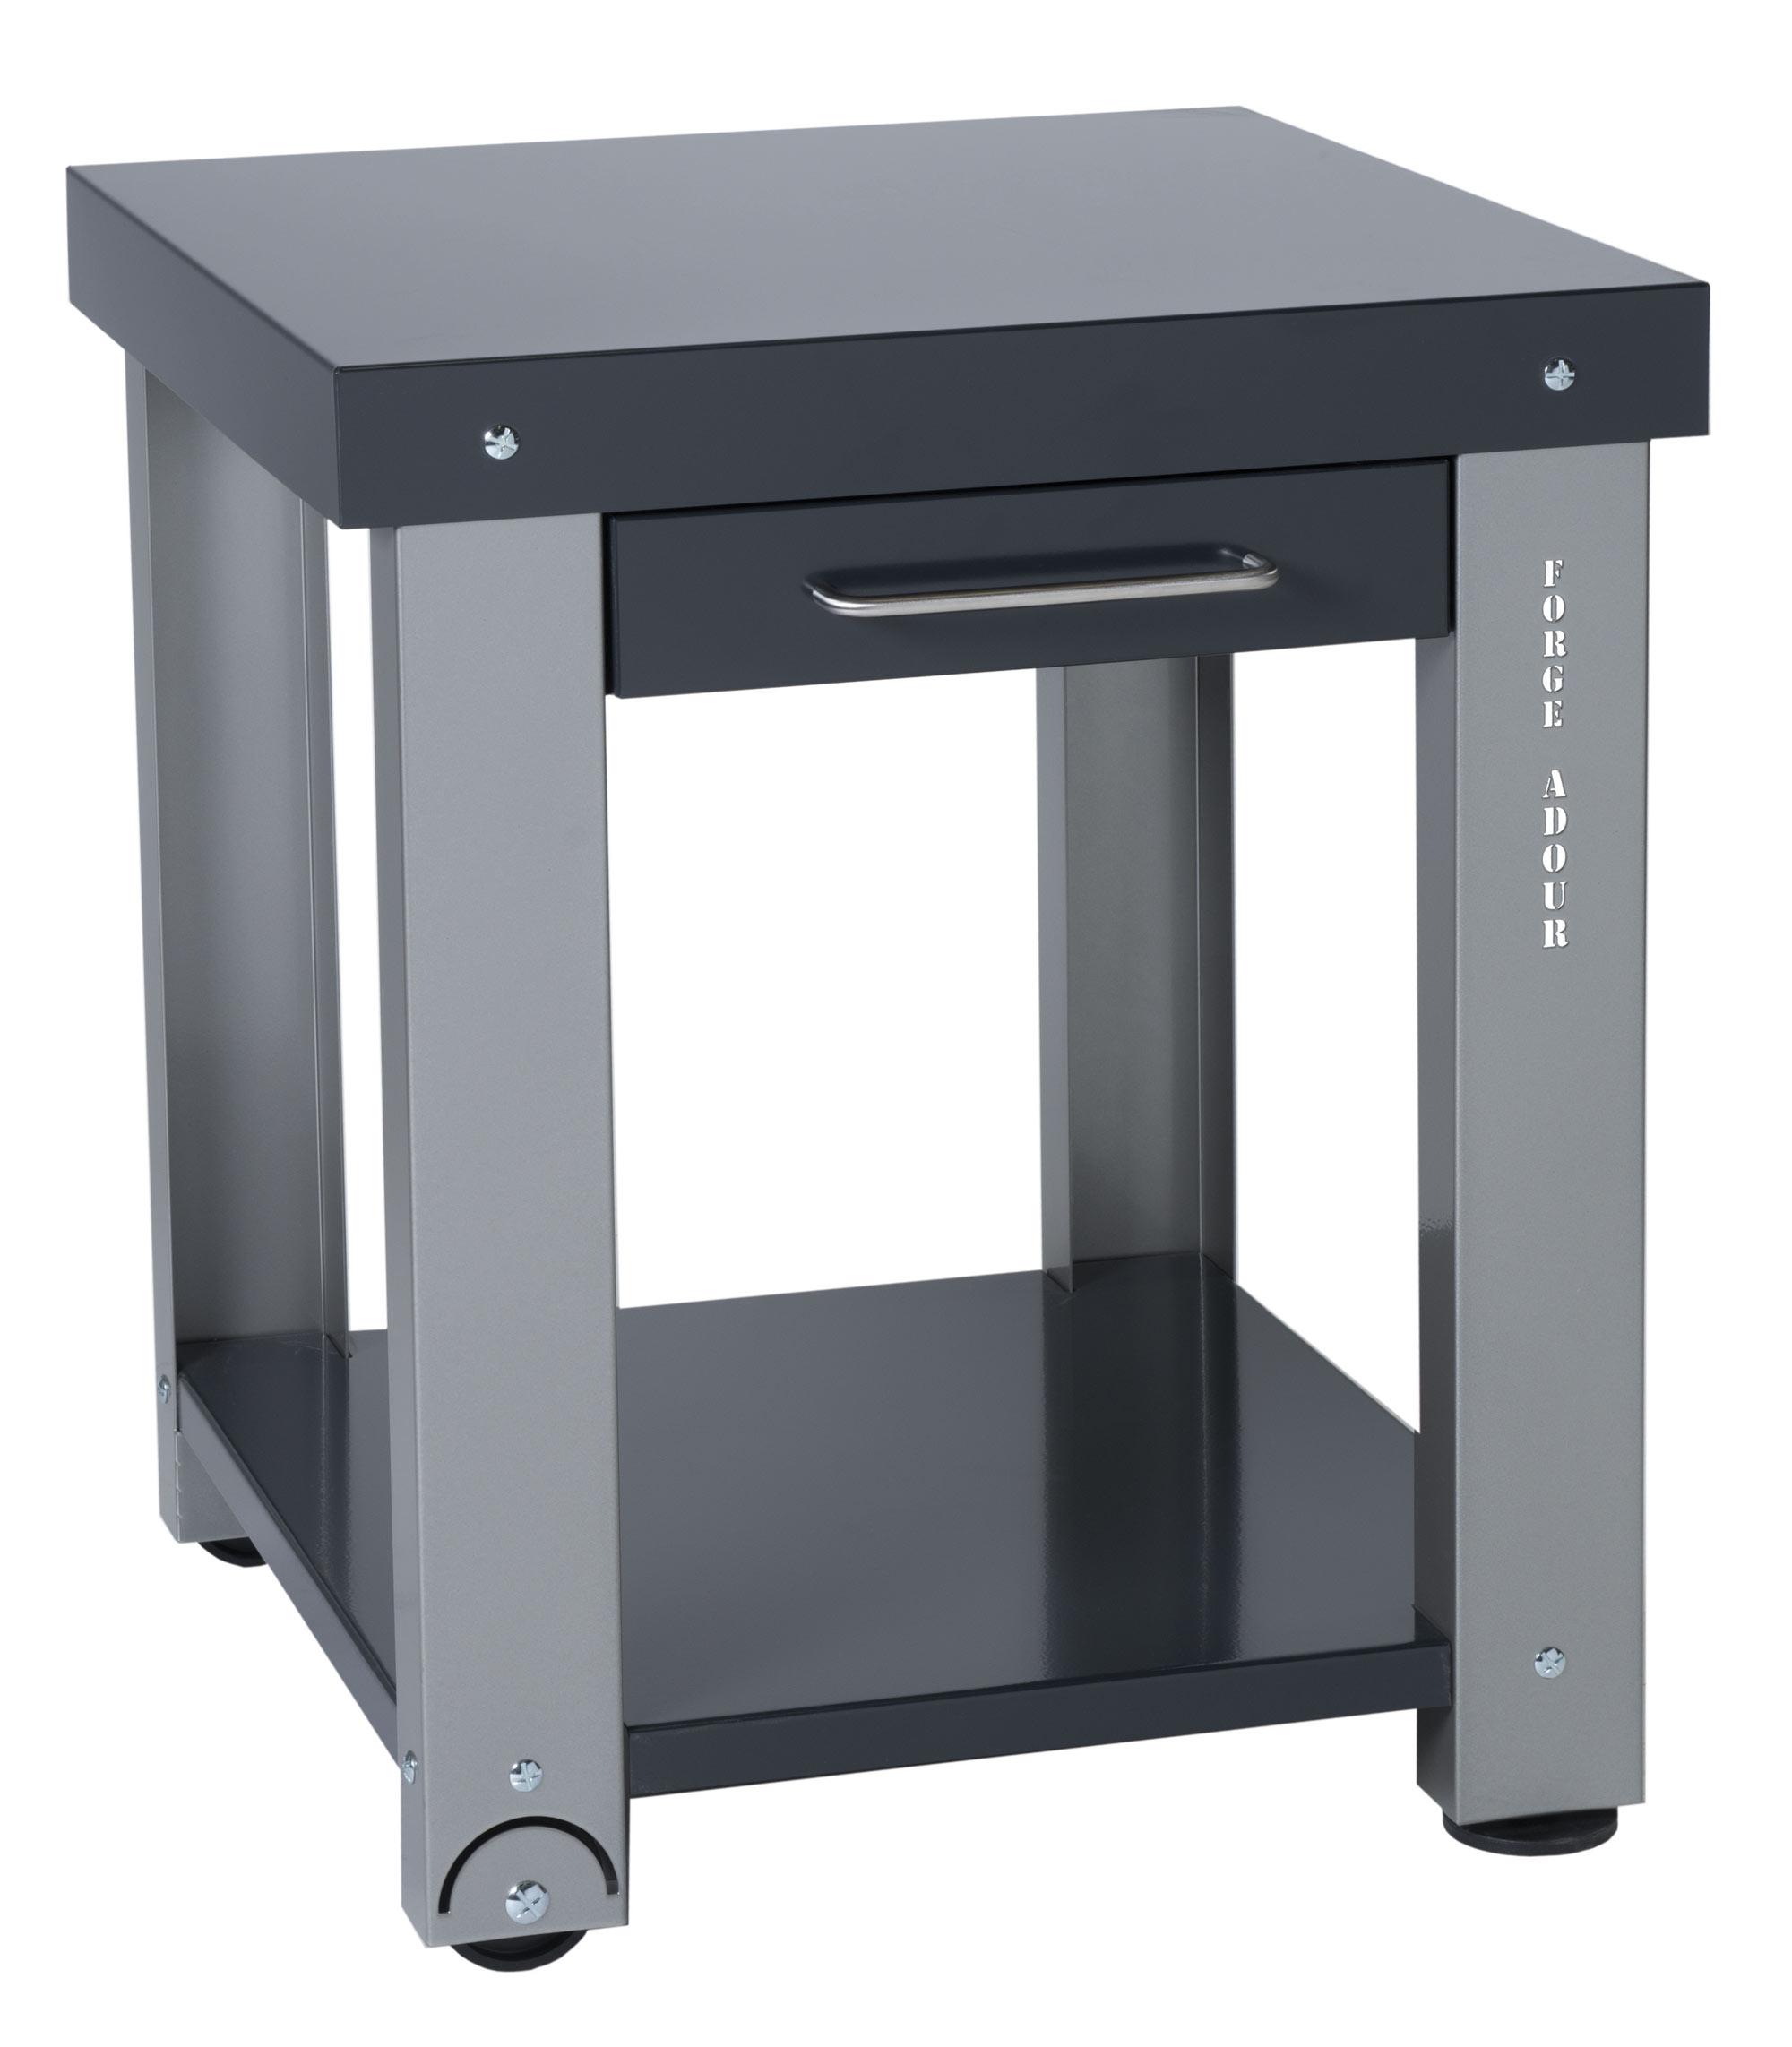 forge caccessoire plancha adour trdf. Black Bedroom Furniture Sets. Home Design Ideas